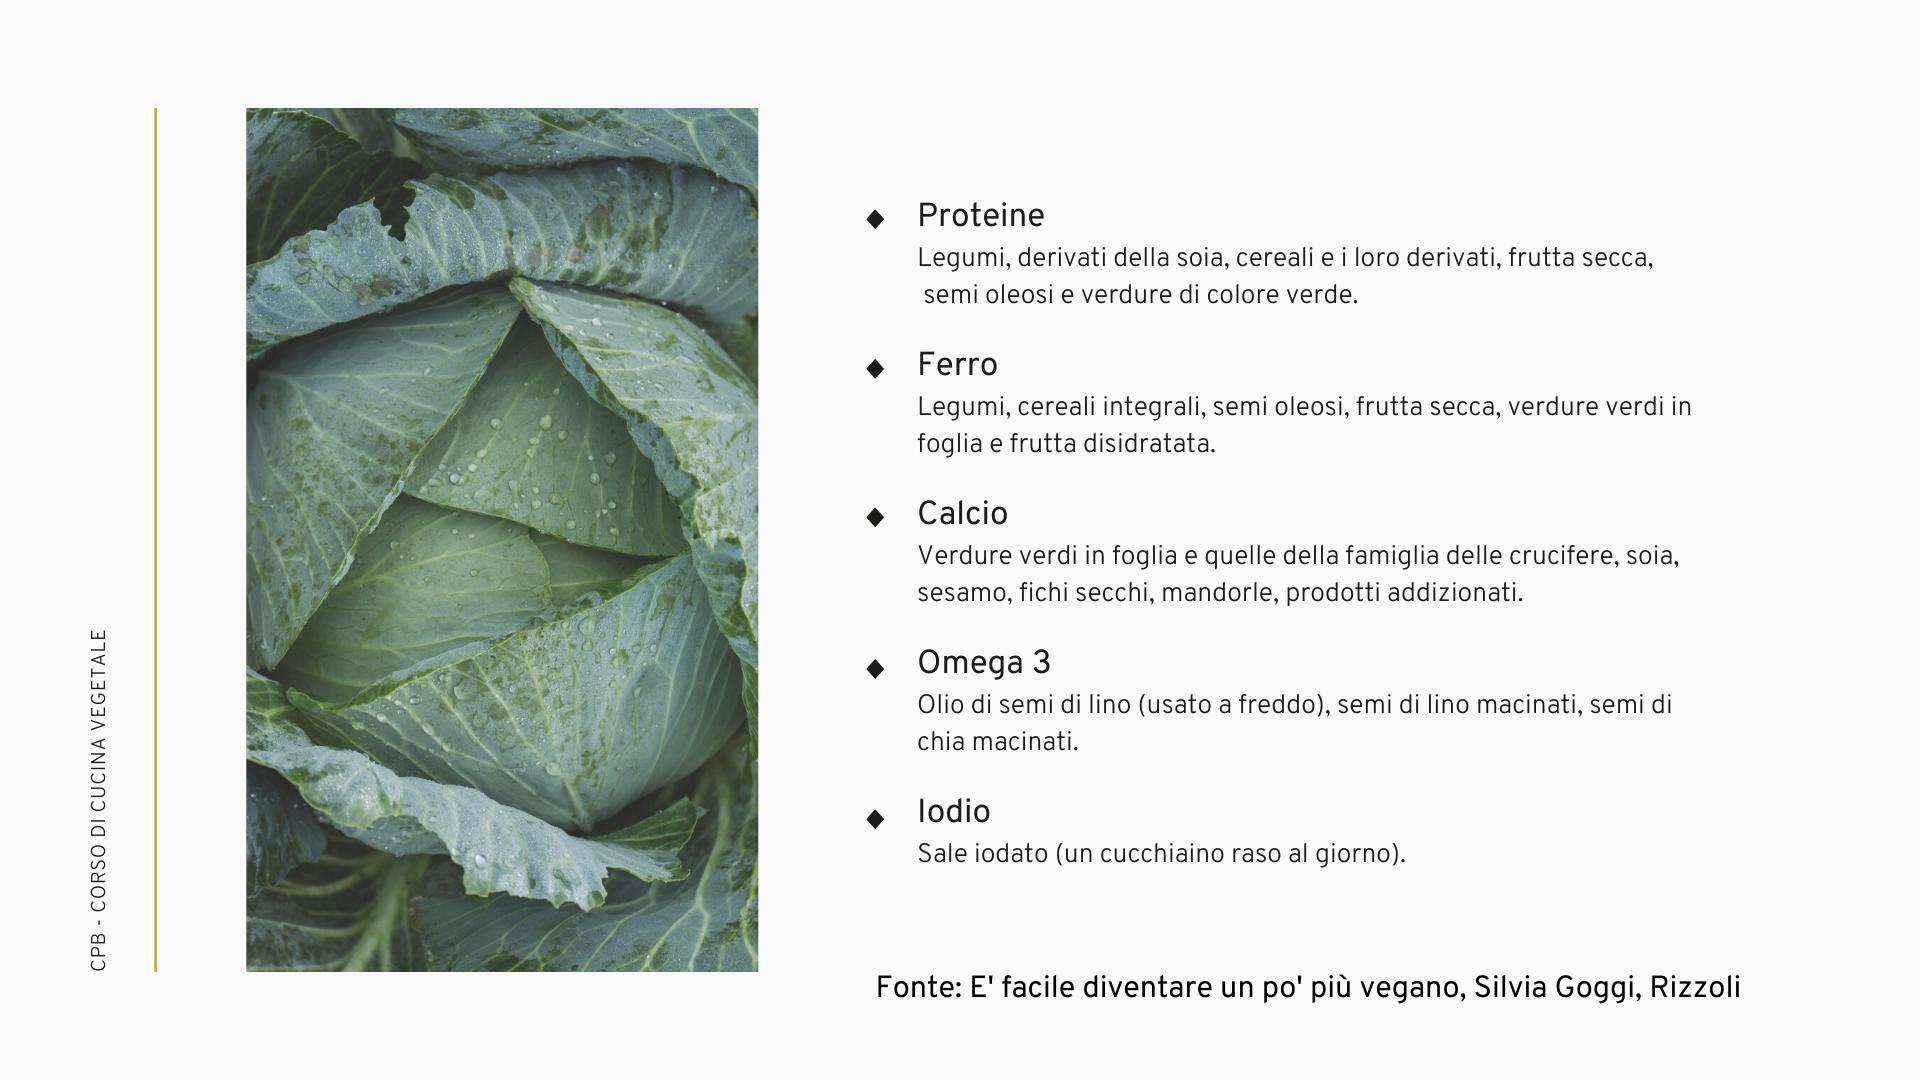 fonti nutritive nelle diete vegetariane